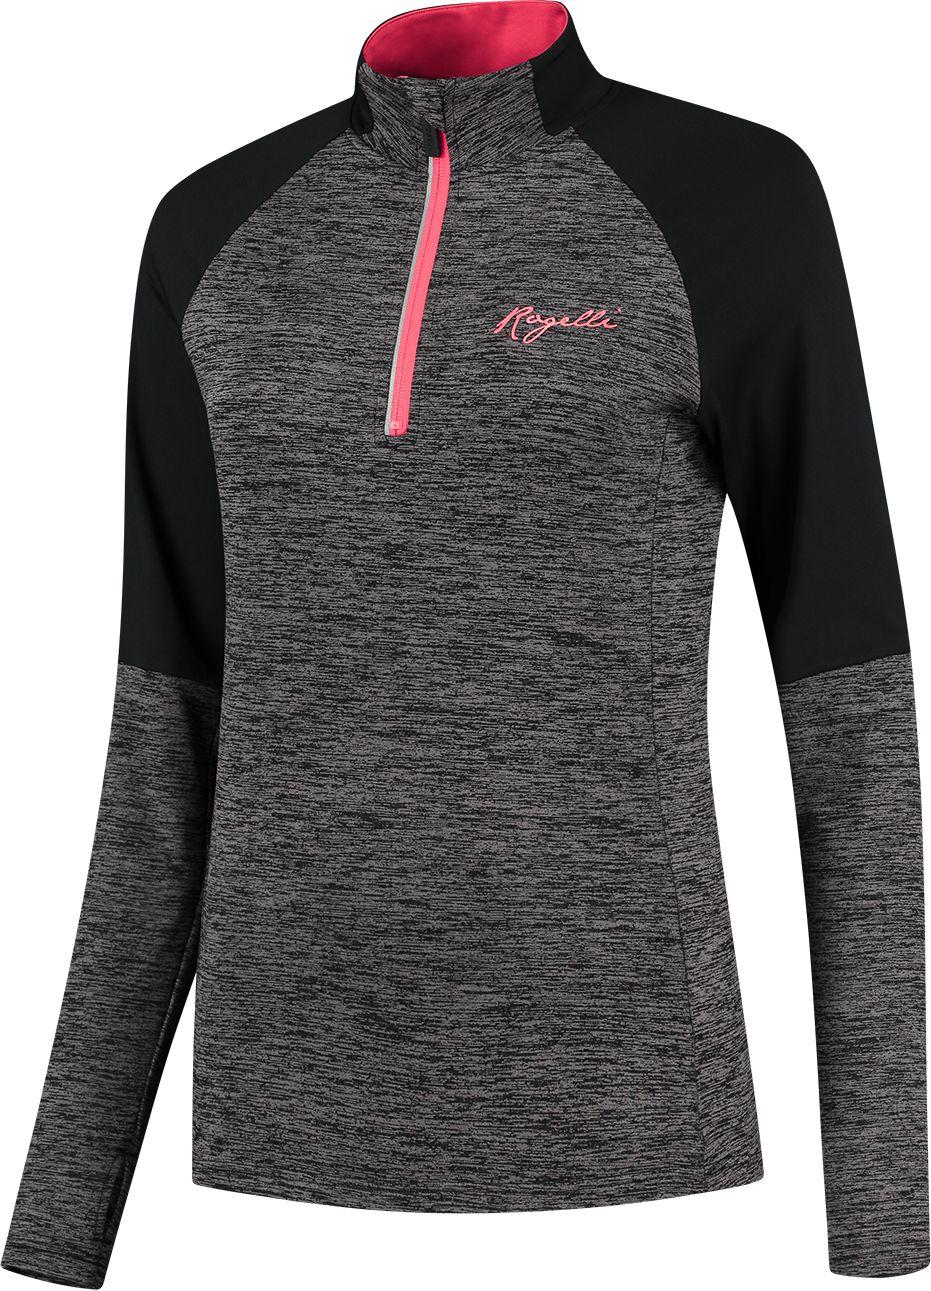 ROGELLI bluza do biegania damska ENJOY grey ROG351109 Rozmiar: S,ROG351109.XS